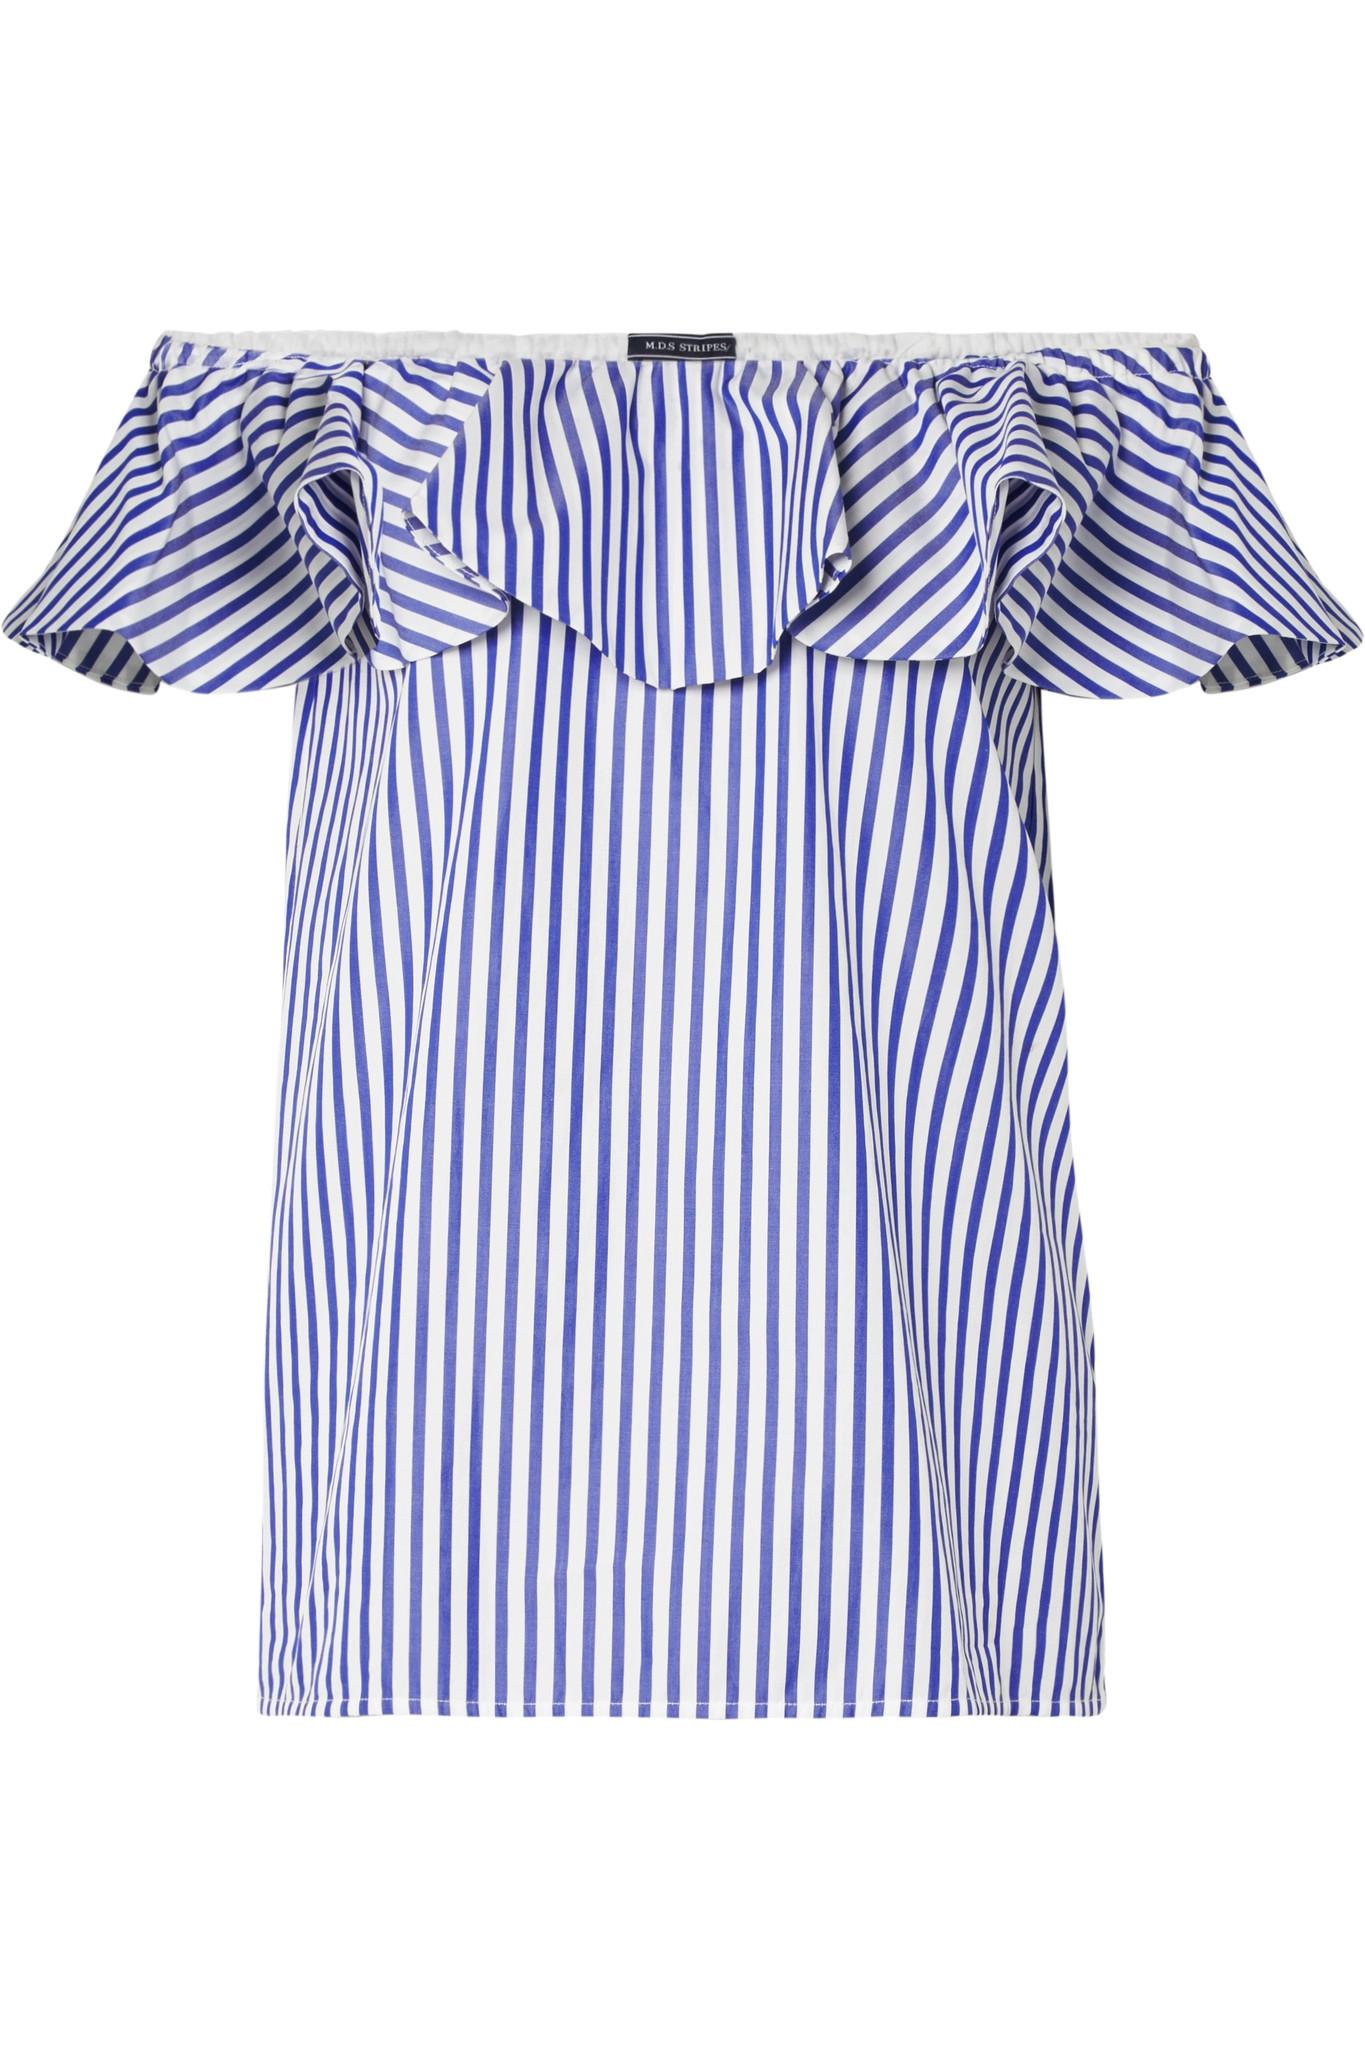 7f79b64b2d919 Mds Stripes Off-the-shoulder Ruffled Striped Cotton-poplin Top in ...